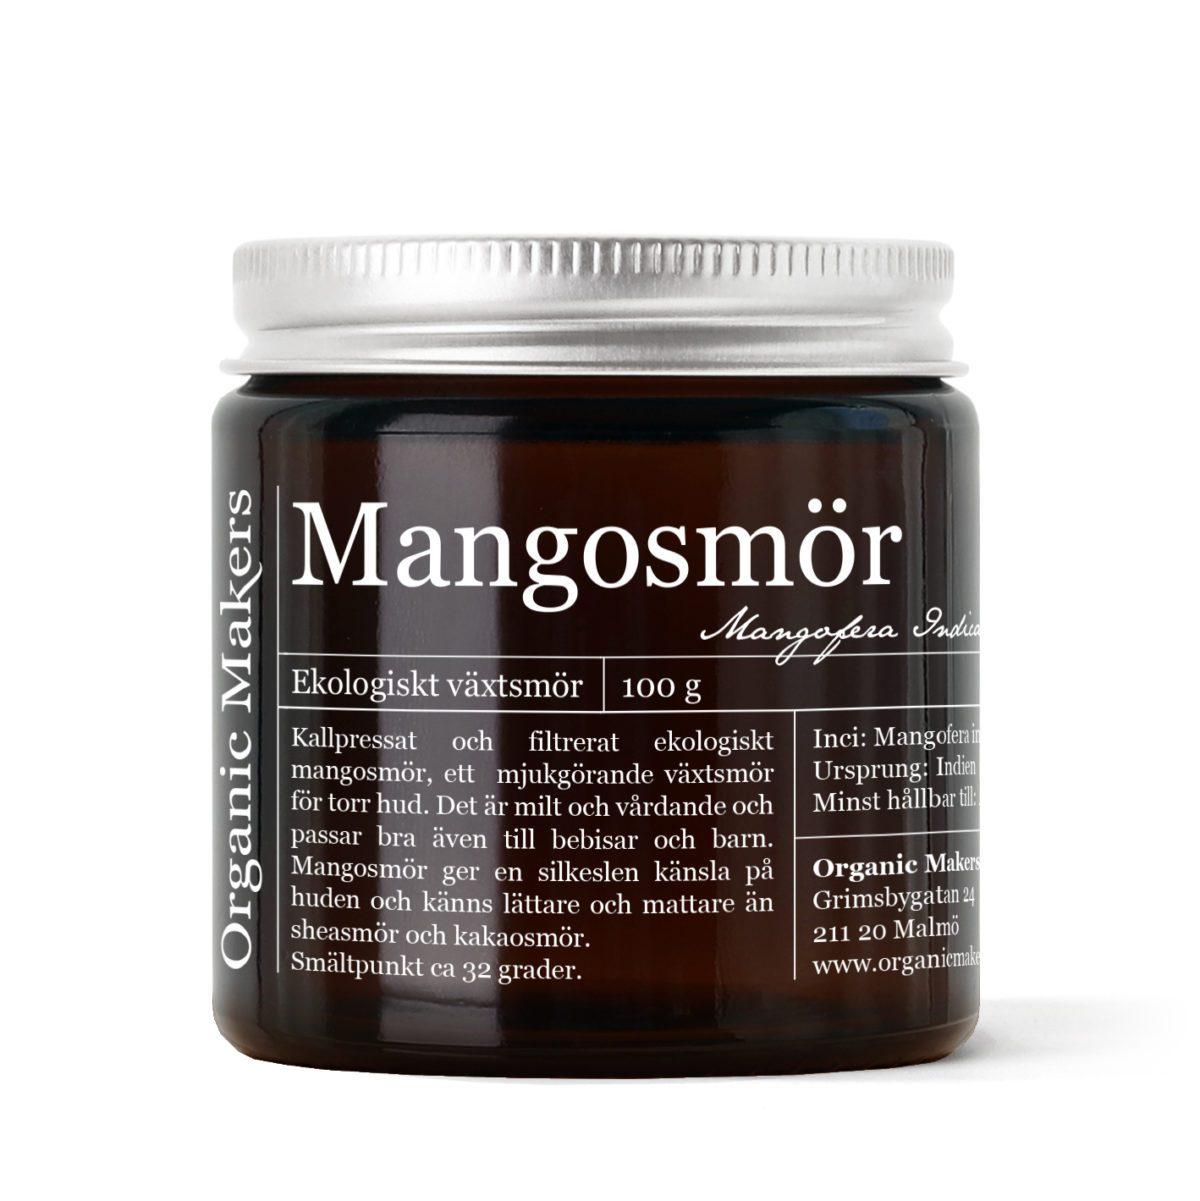 Mangosmör ekologiskt i brun glasburk